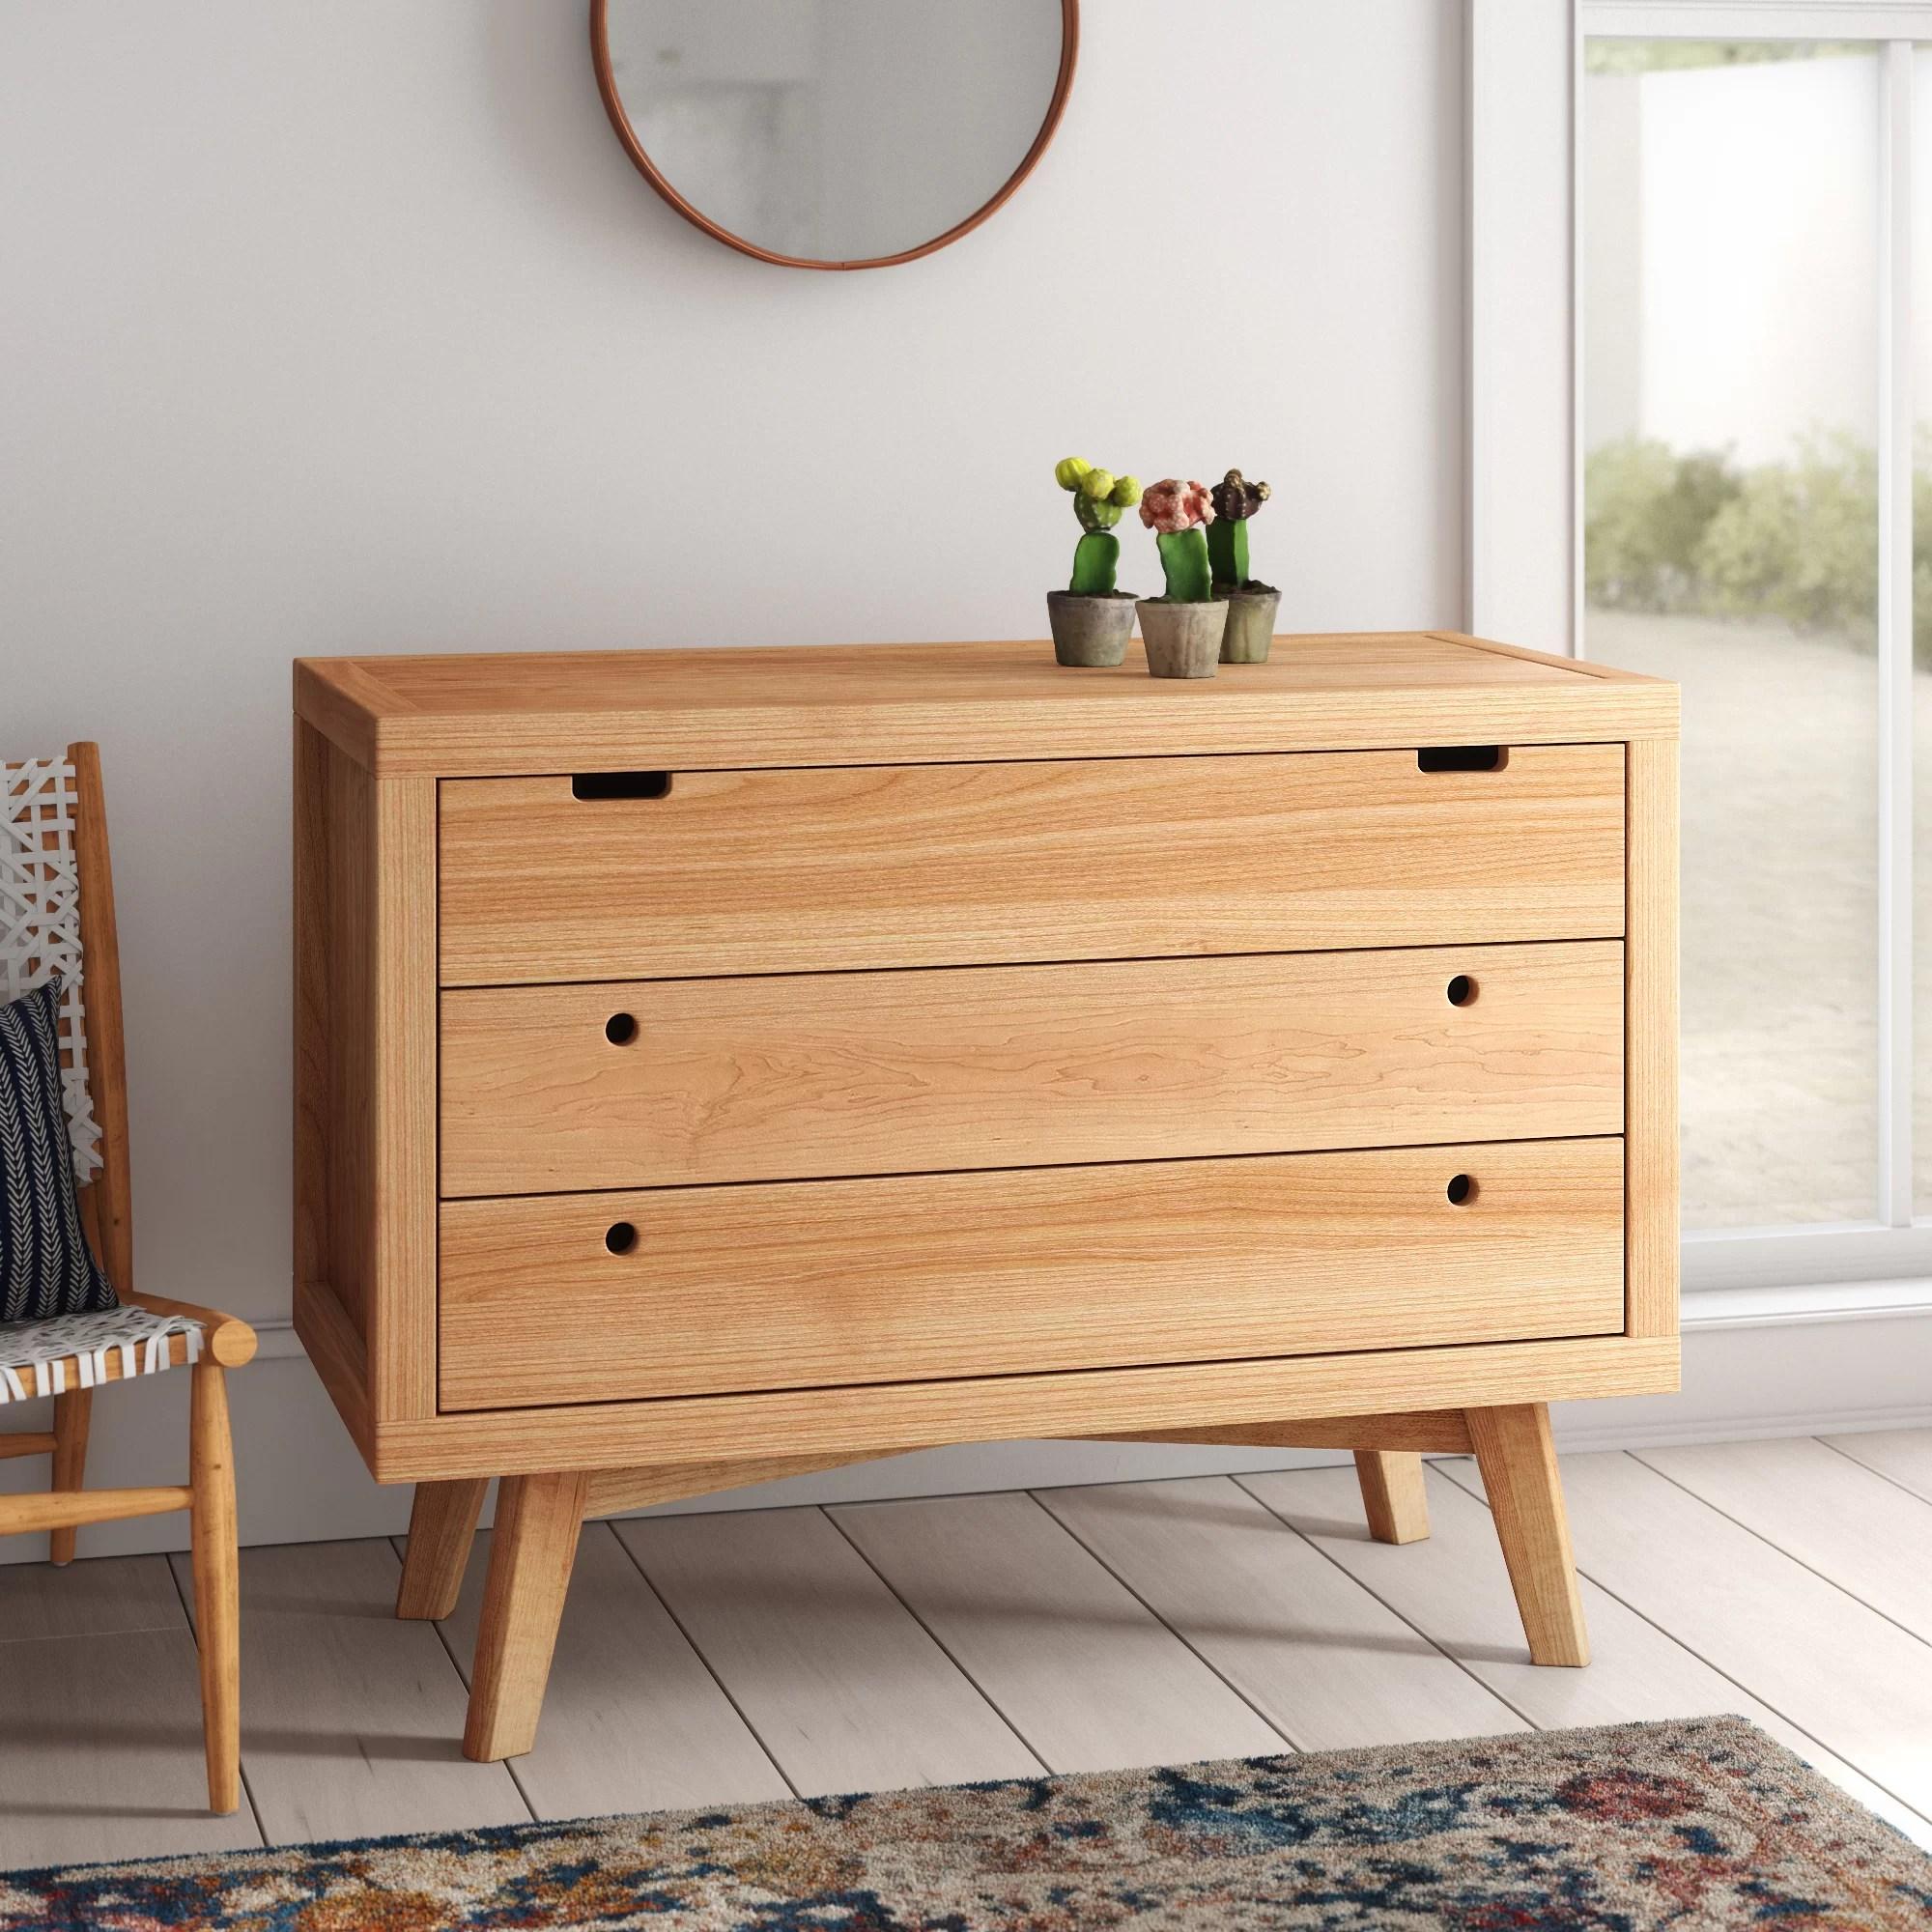 rachel retro 3 drawer dresser